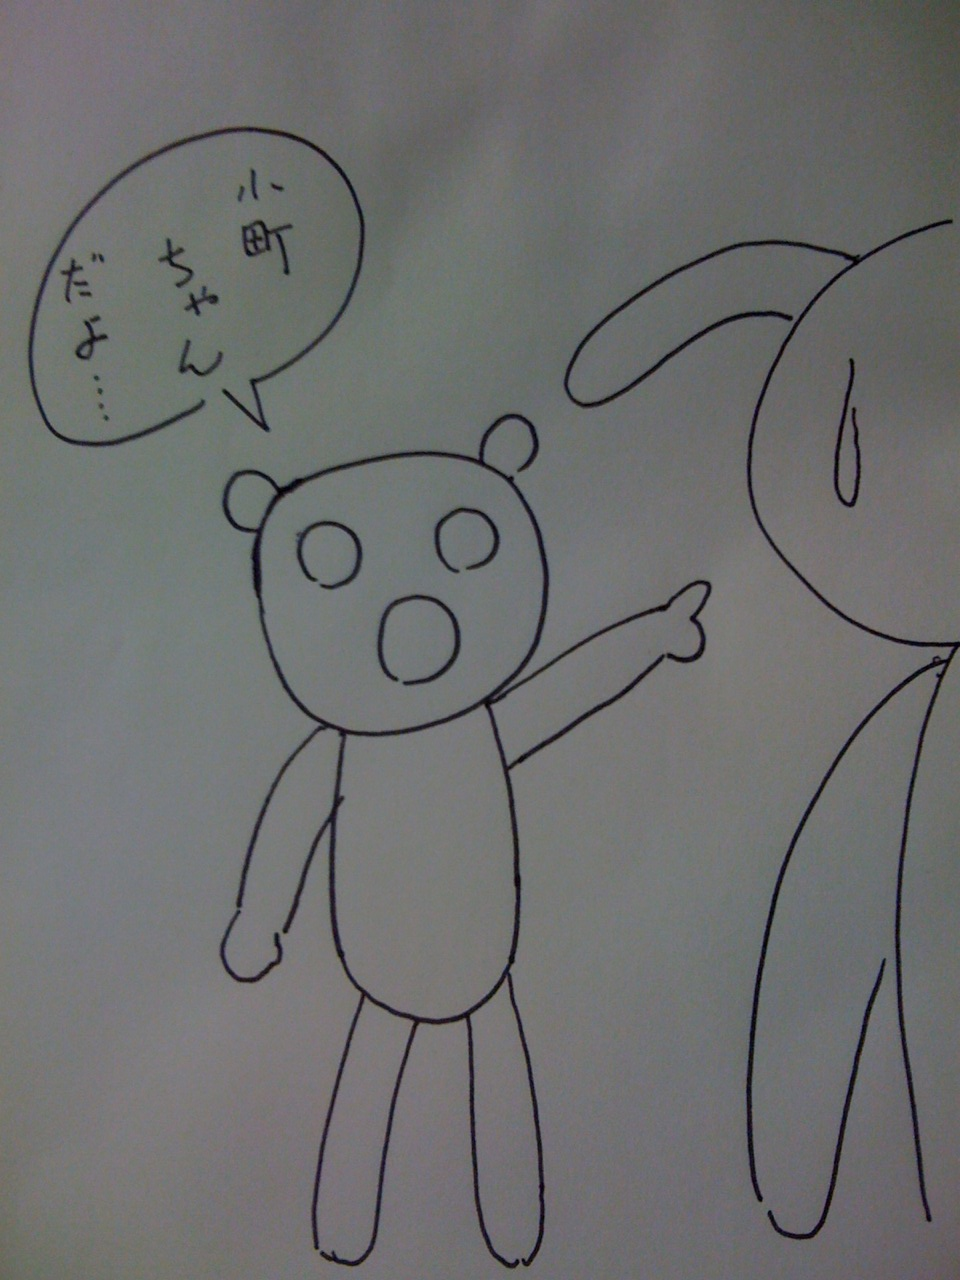 Komachi